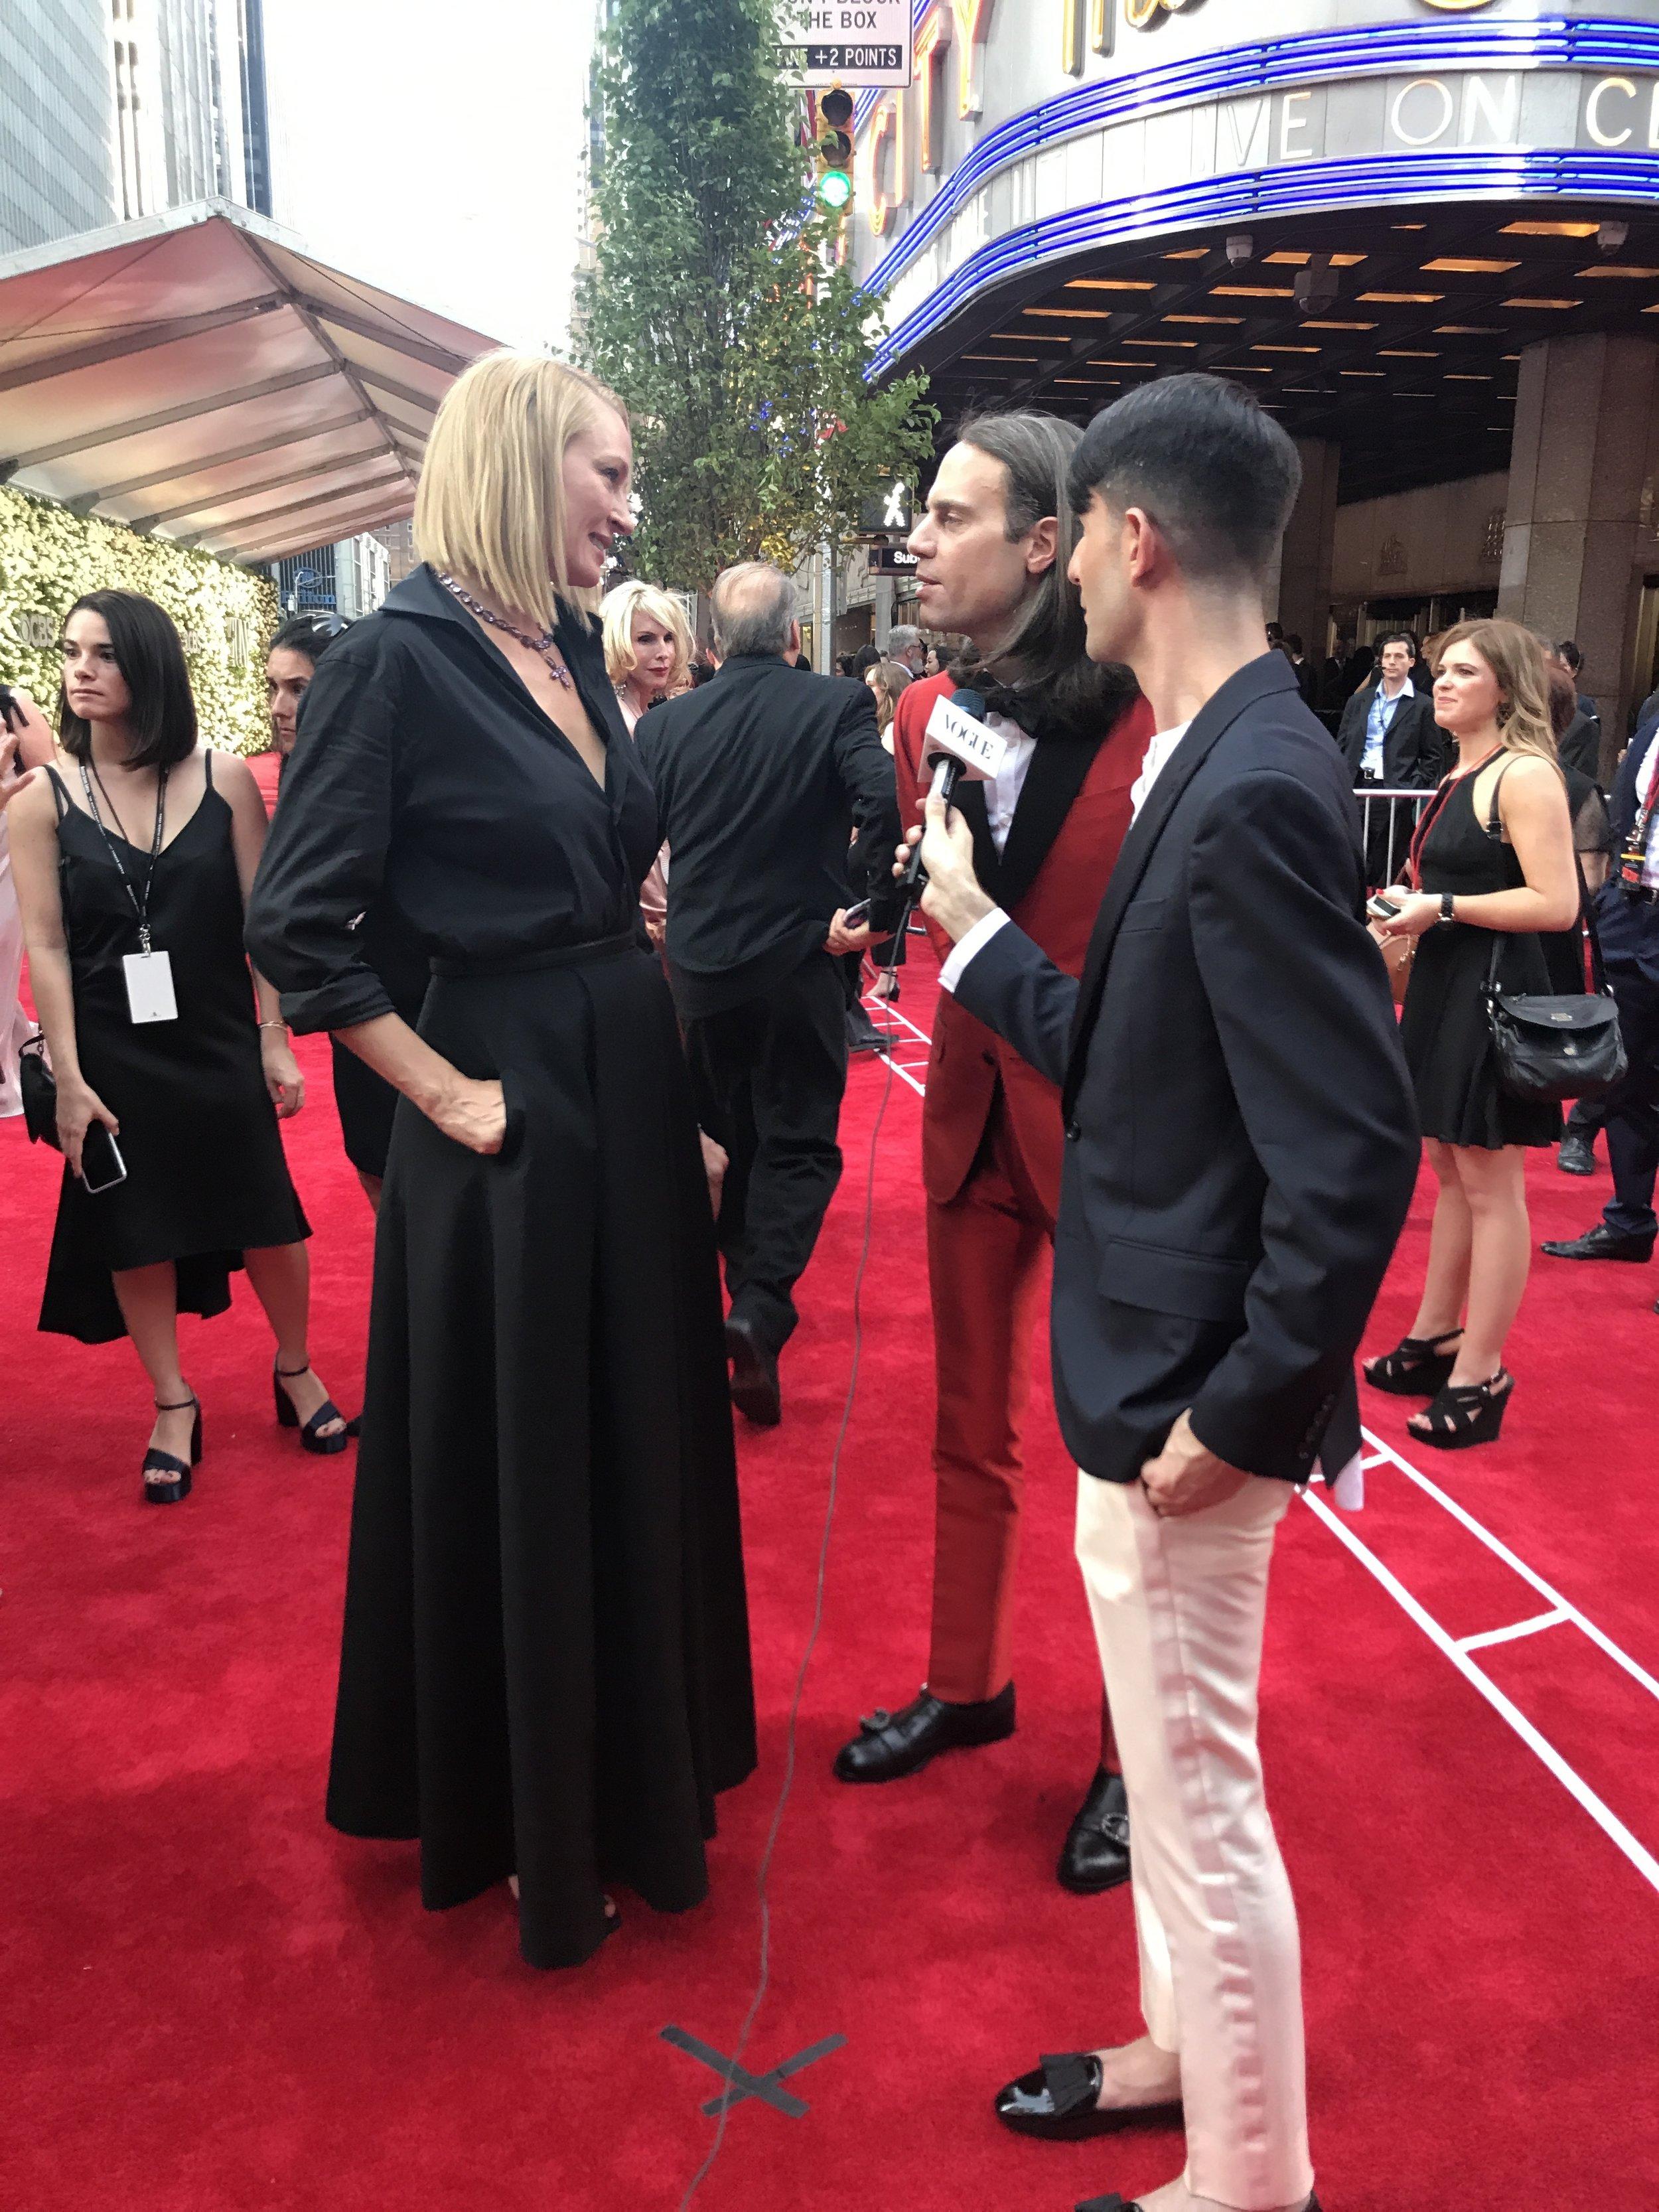 Tony Awards Presenter Uma Thurman talks to Broadway producer and style icon Jordan Roth and Vogue.com's Style Editor Edward Barsamian.